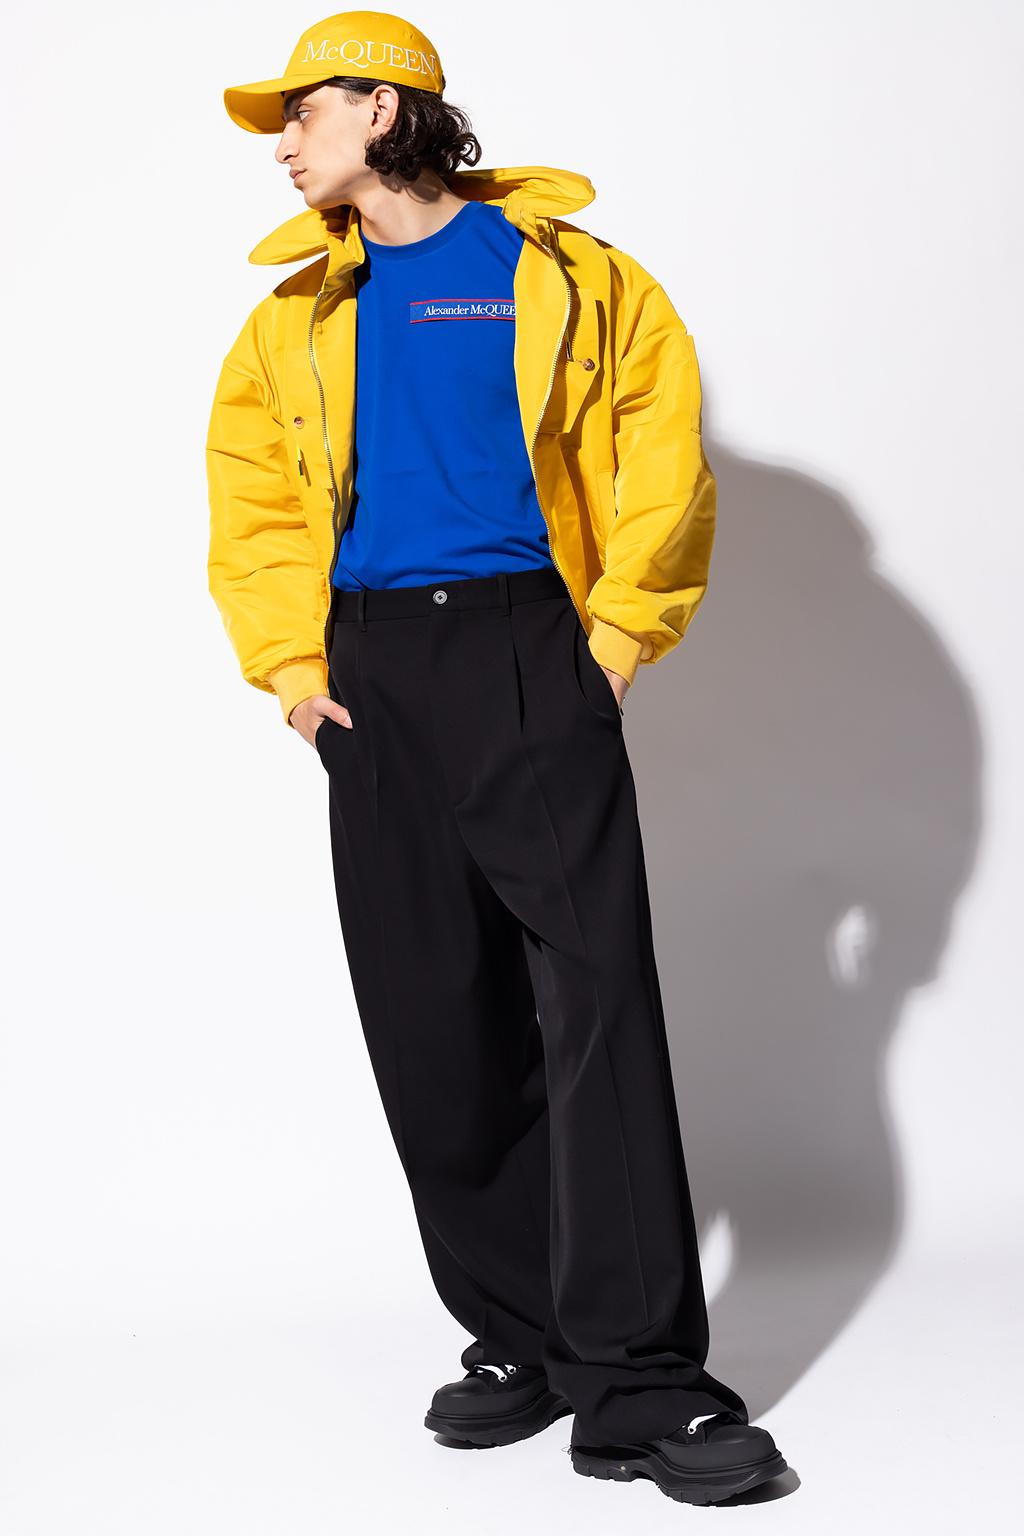 Alexander McQueen Jacket with pockets